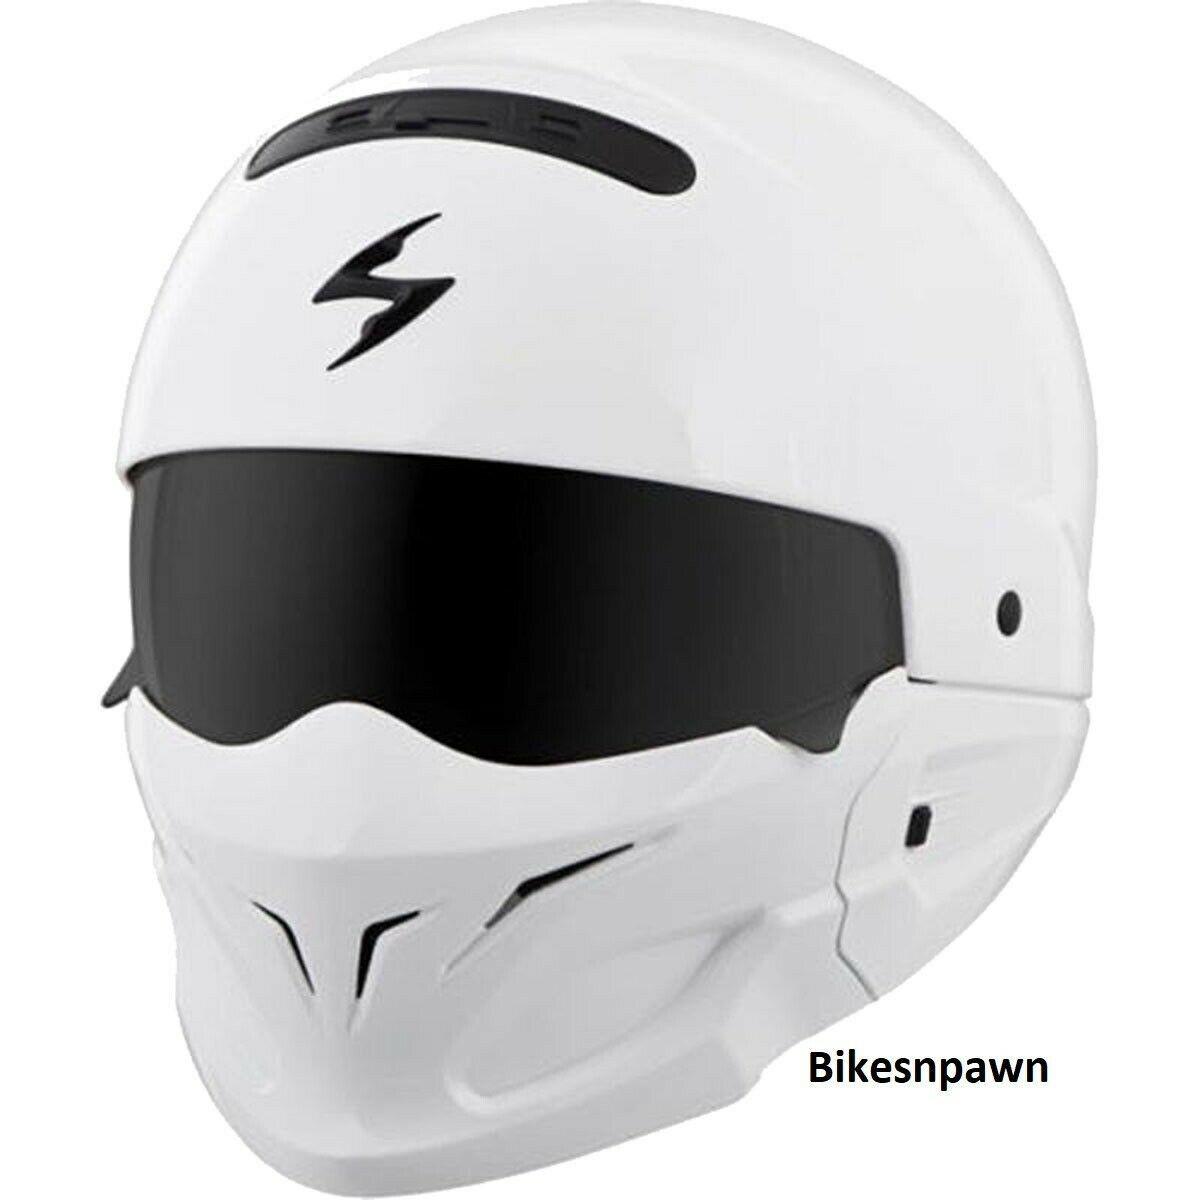 New Size M Scorpion EXO Covert White 3 in 1 Motorcycle Helmet DOT